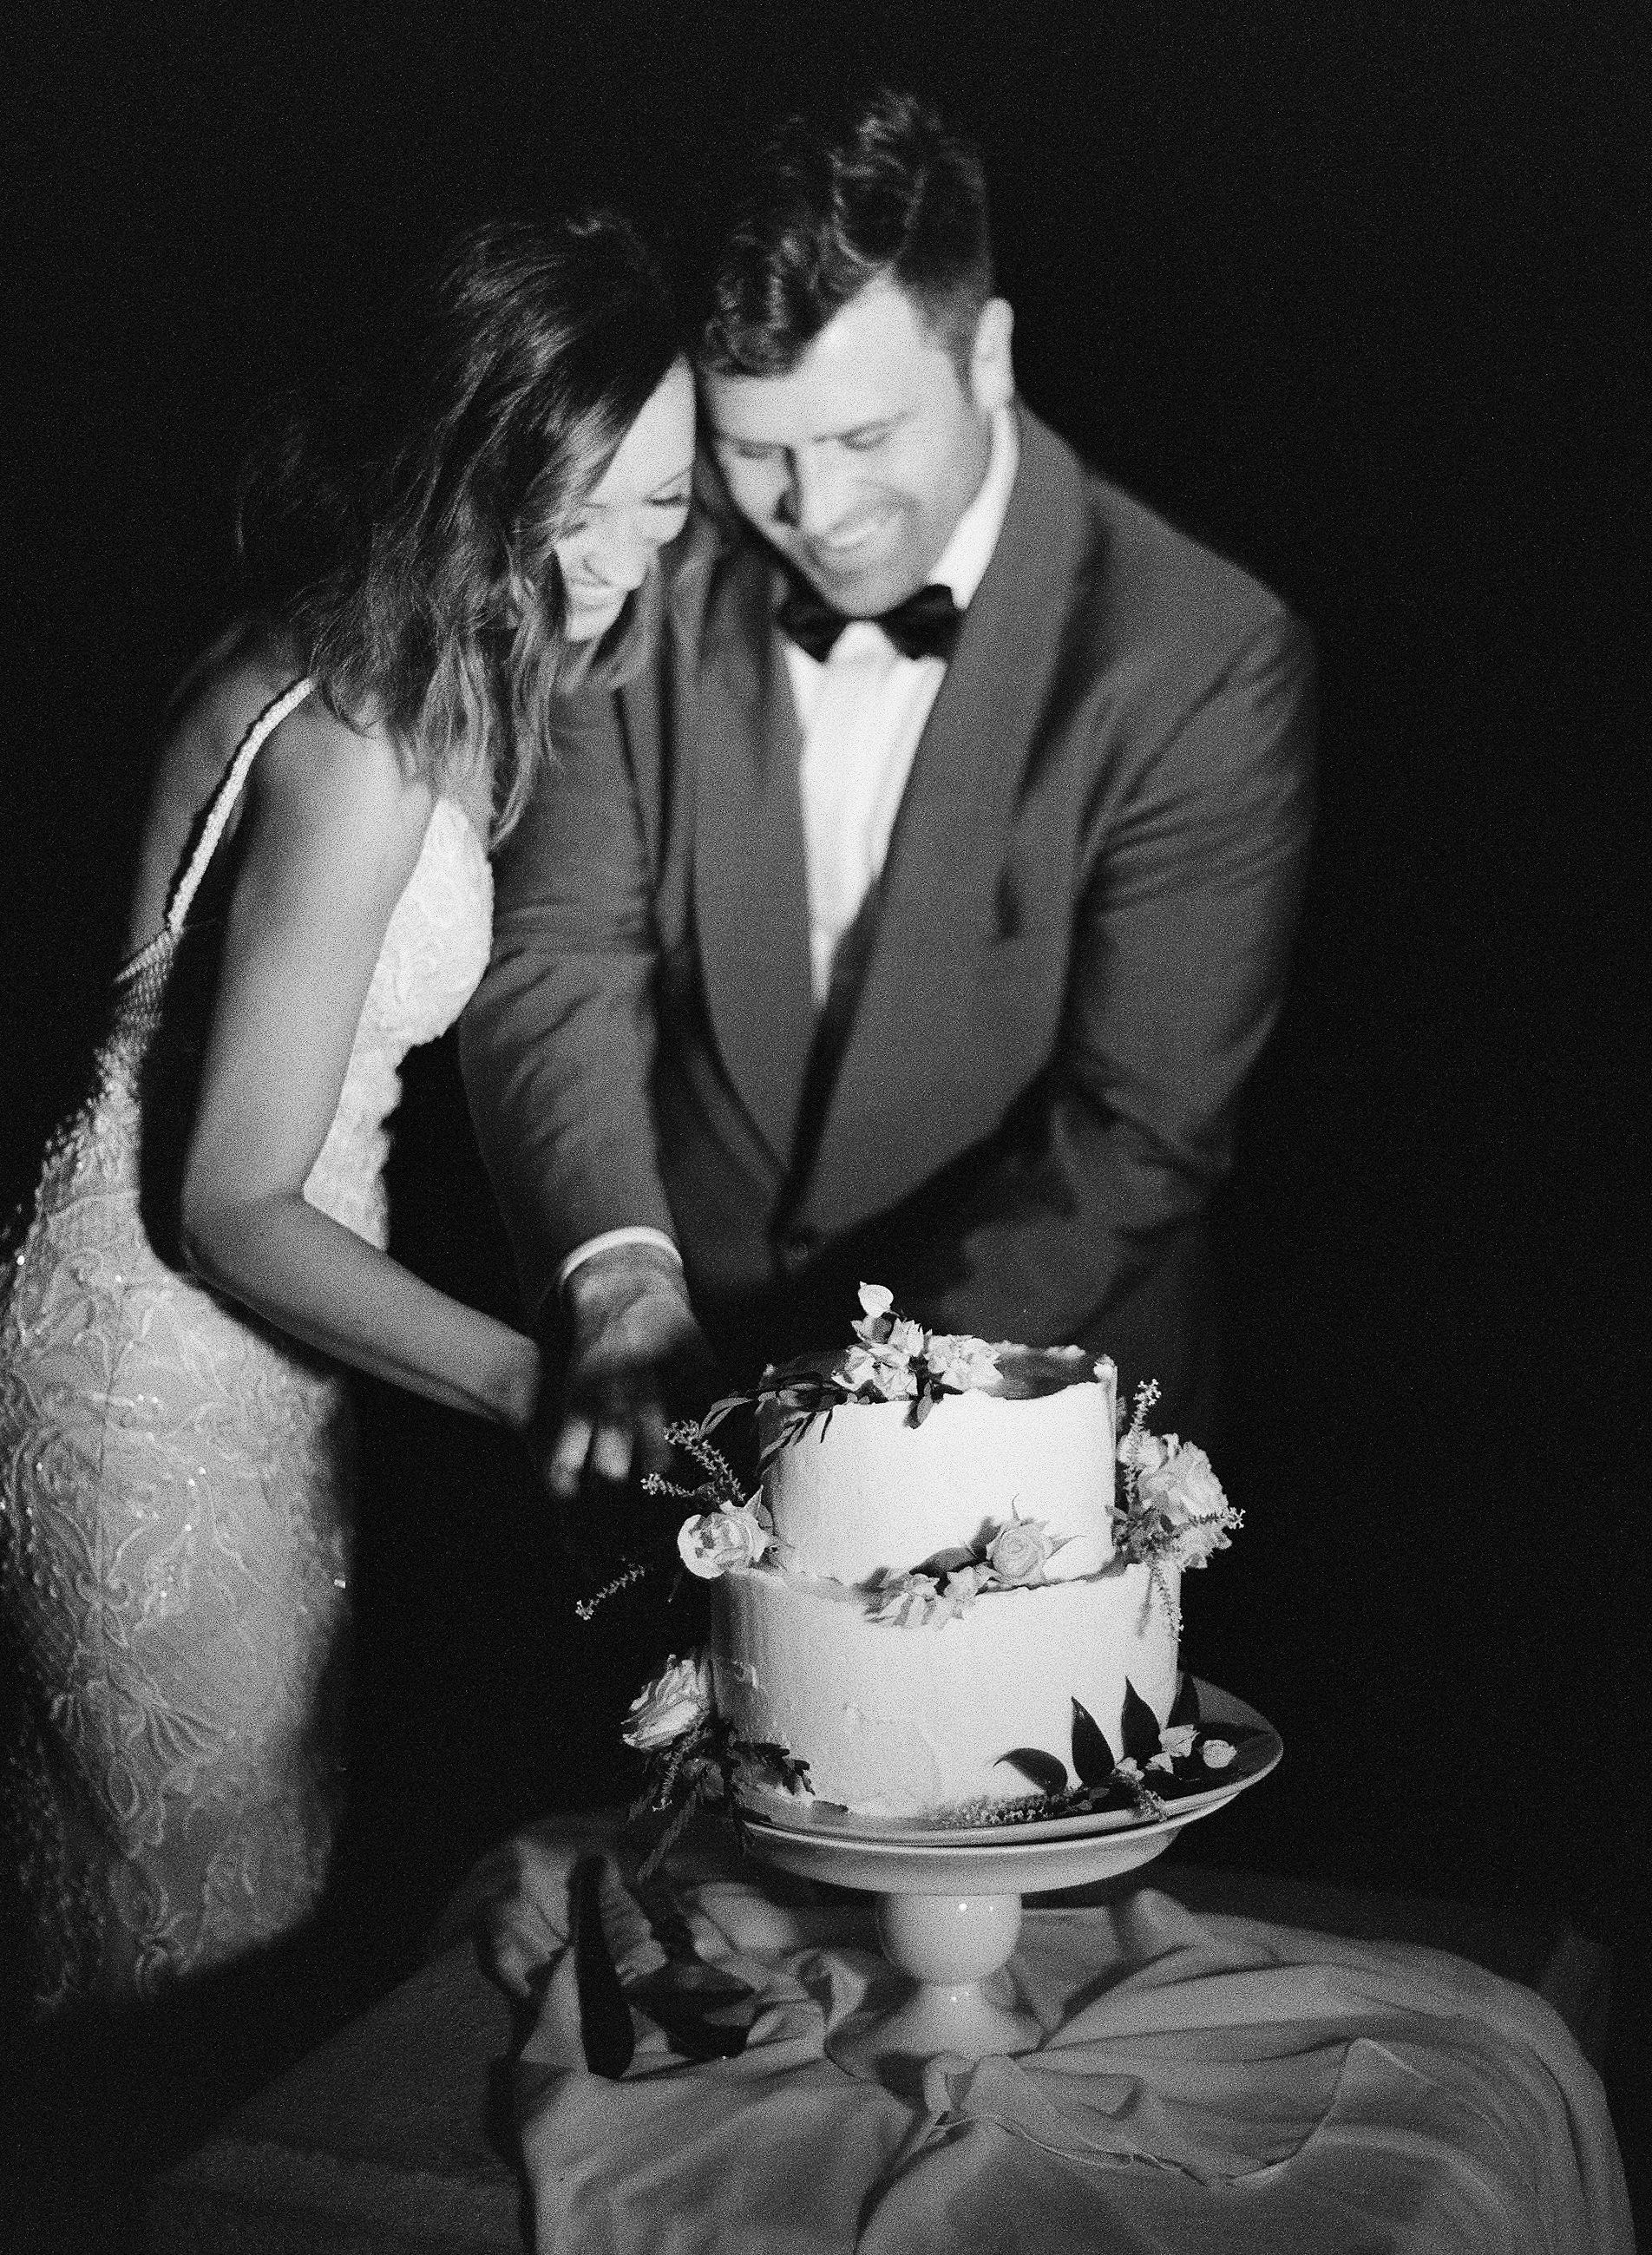 jessica ryan wedding bride and groom cutting cake